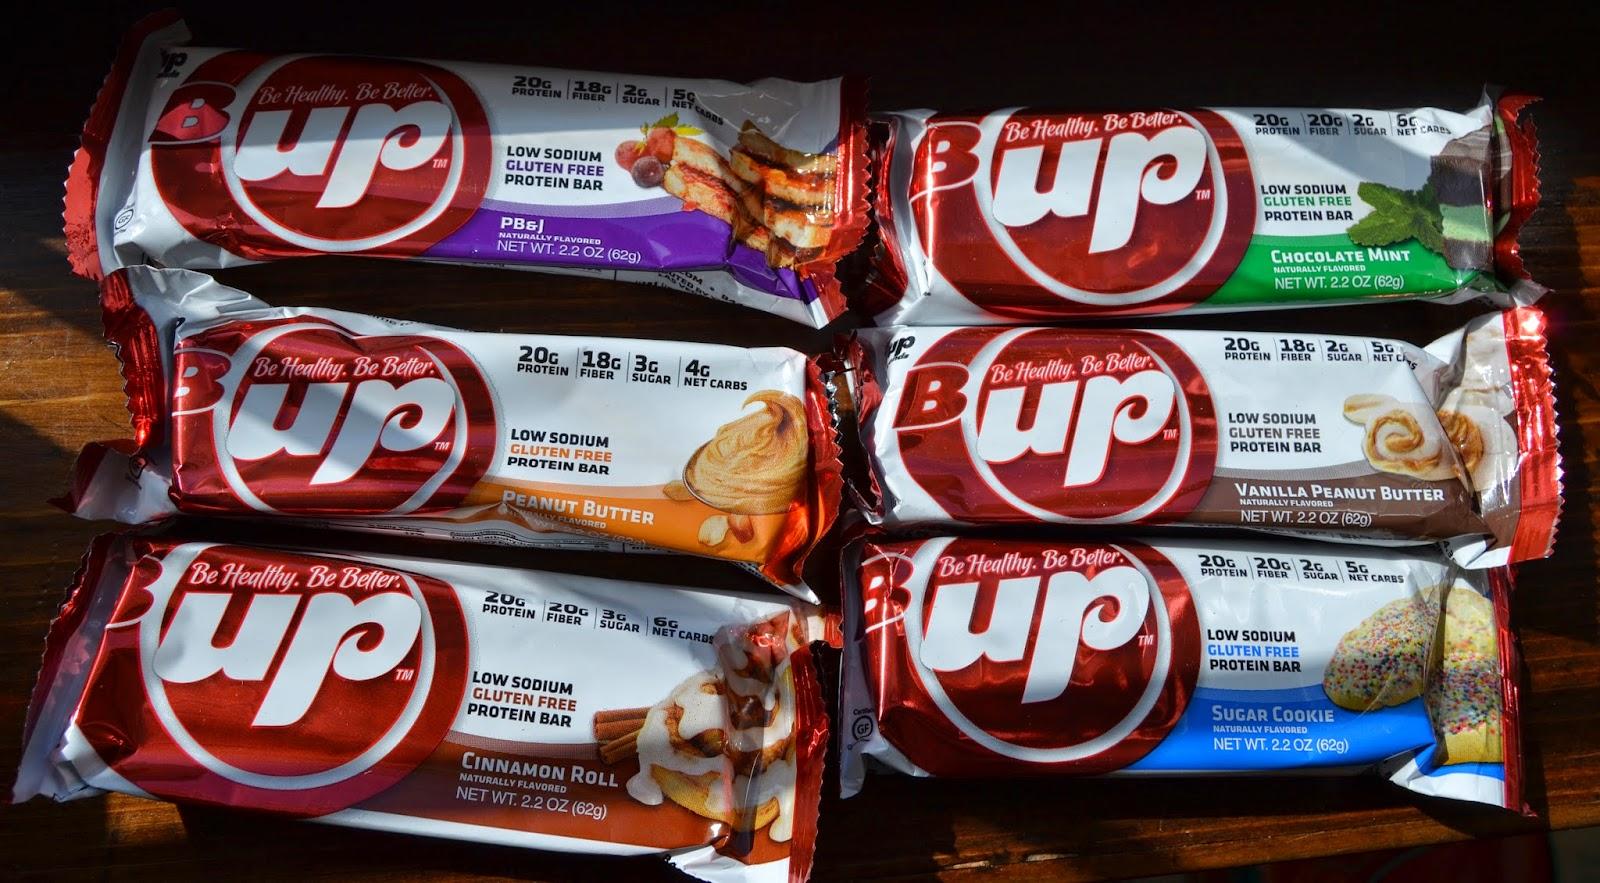 B-UP Bars